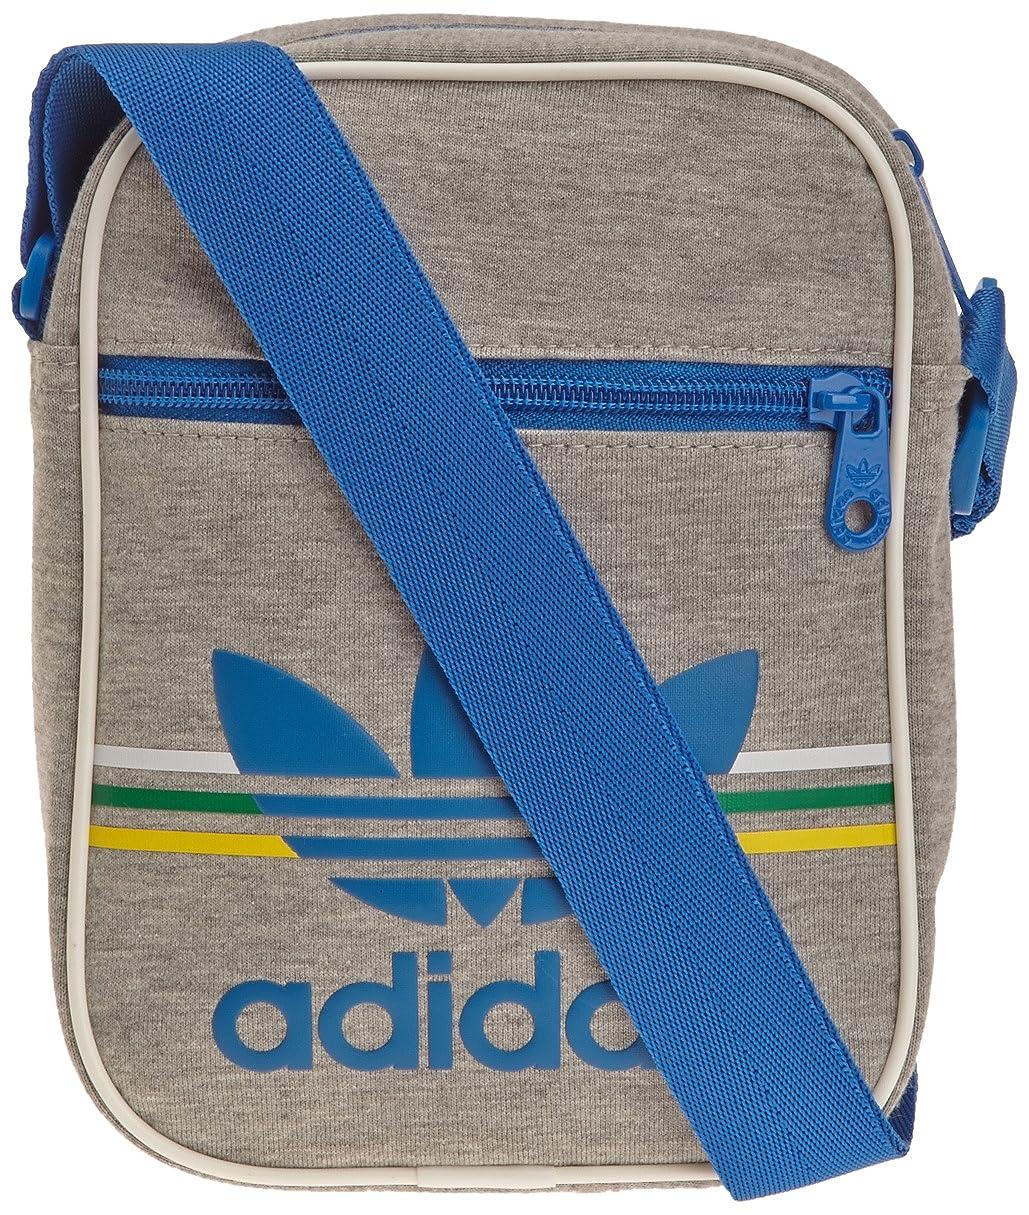 Accessorio Minibag Jersey Medium Grey Heather/Blanc ADIDAS Borsello Jersey 15 x 6 x 20 cm G86754